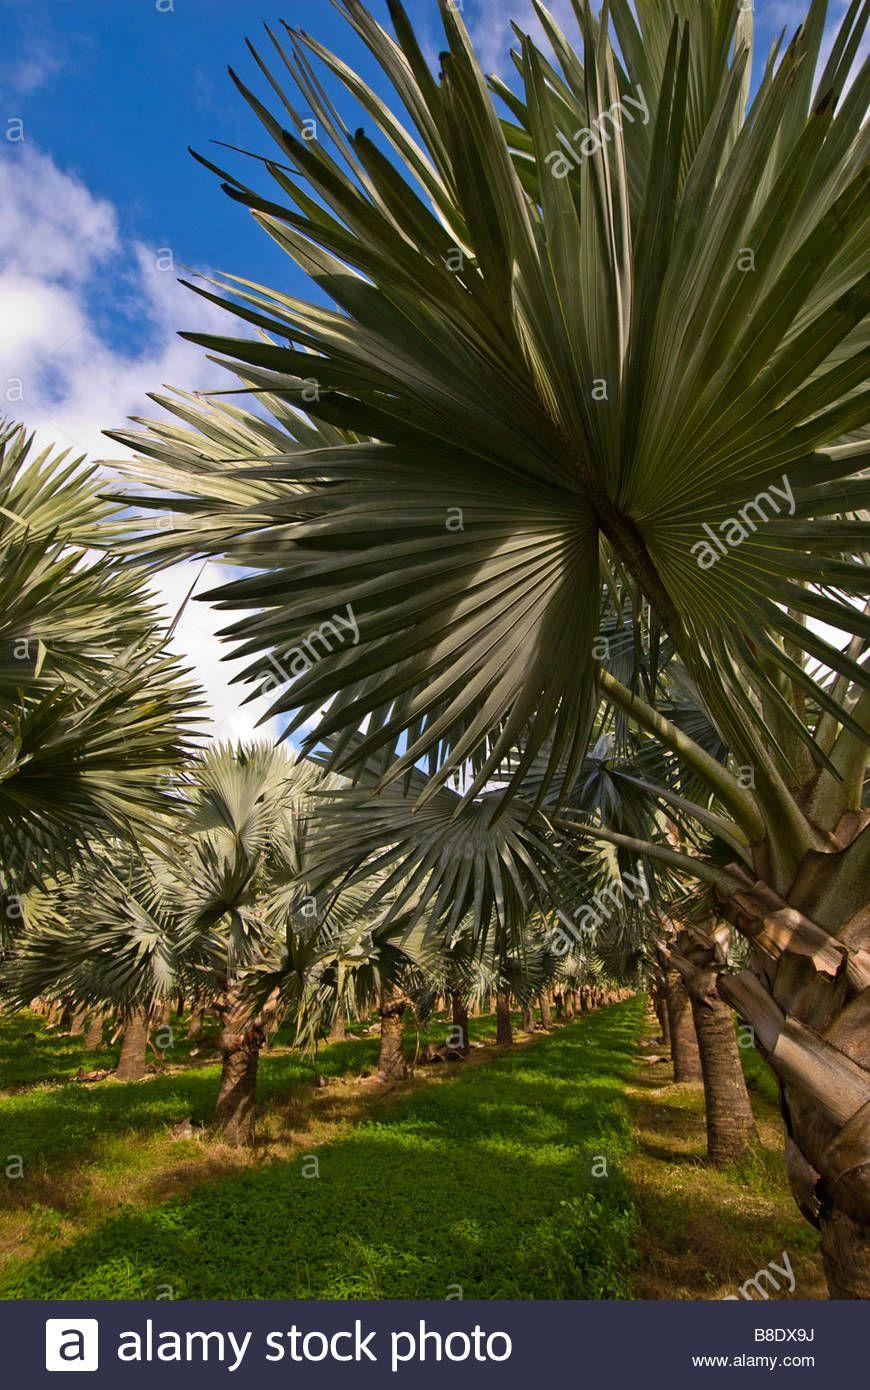 Silver Palm Trees Homestead Florida Foliage Fields Tree